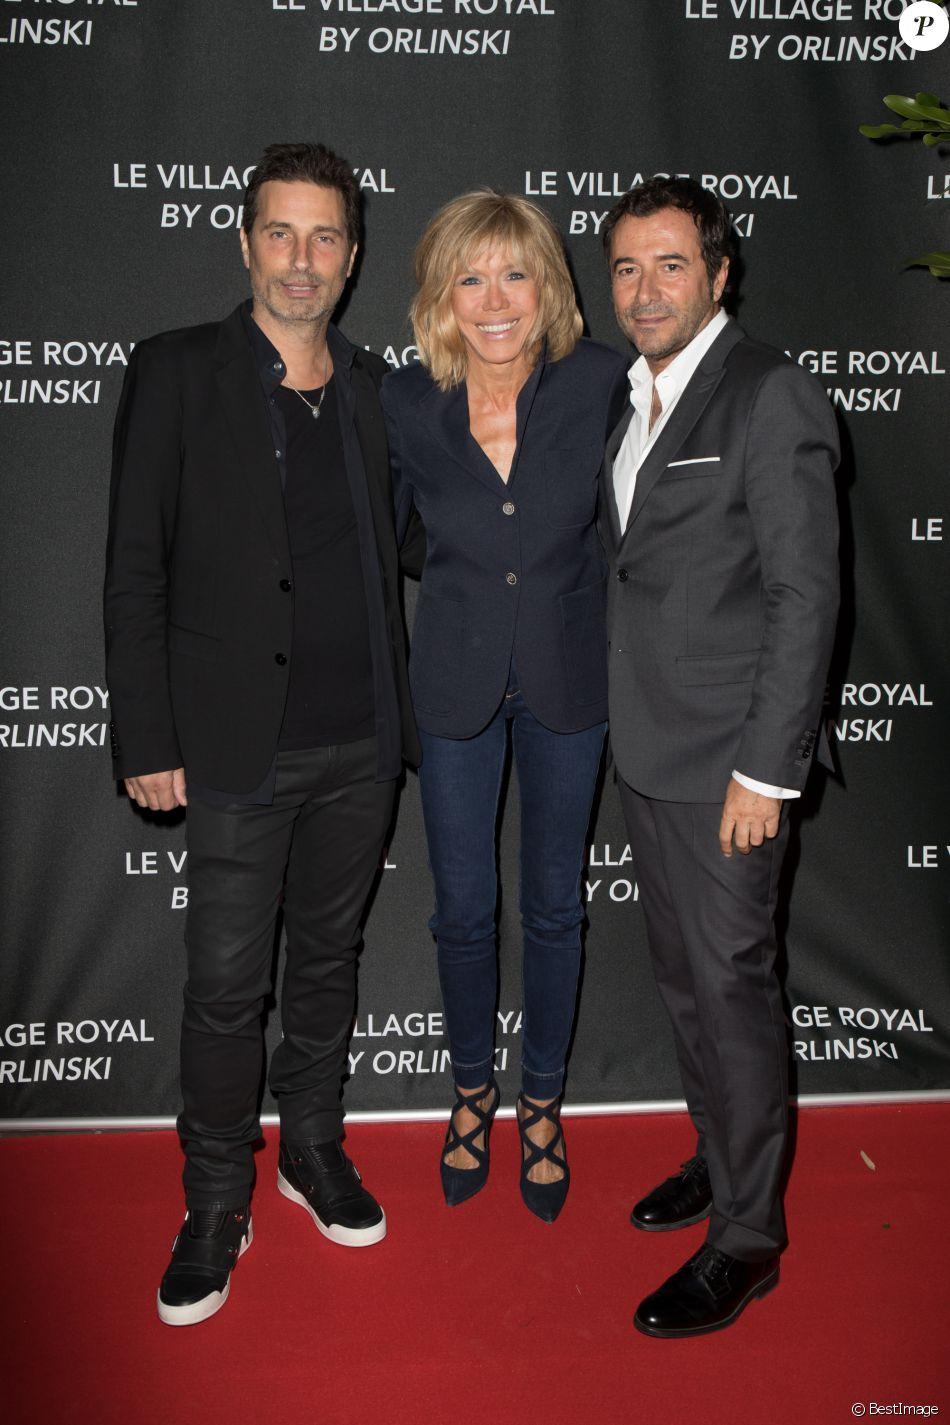 Exclusif richard orlinski brigitte macron trogneux bernard montiel l 39 inauguration du - Bernard montiel et sa compagne ...